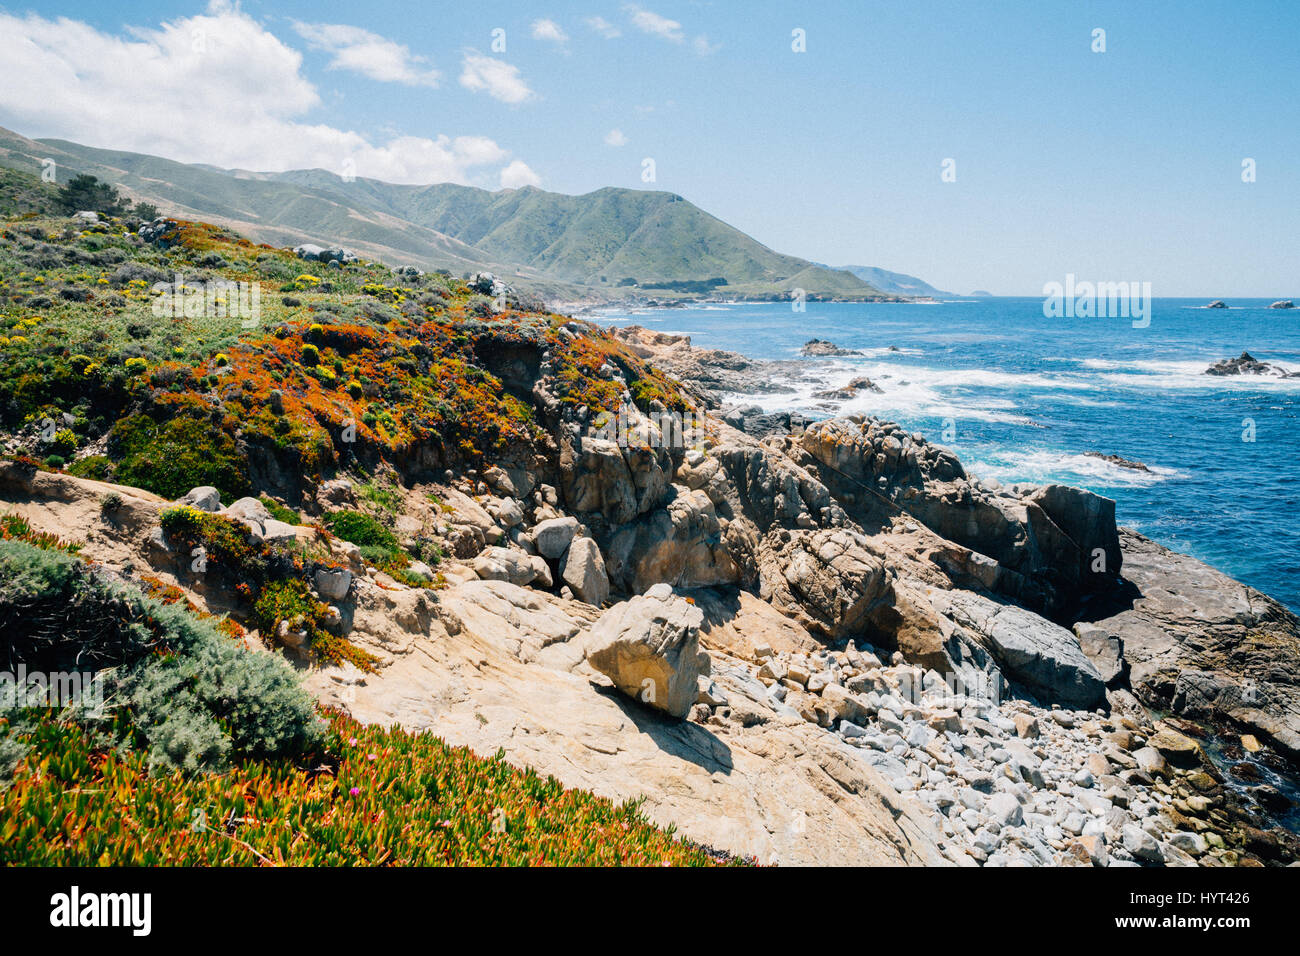 Big Sur California Coastline - Stock Image